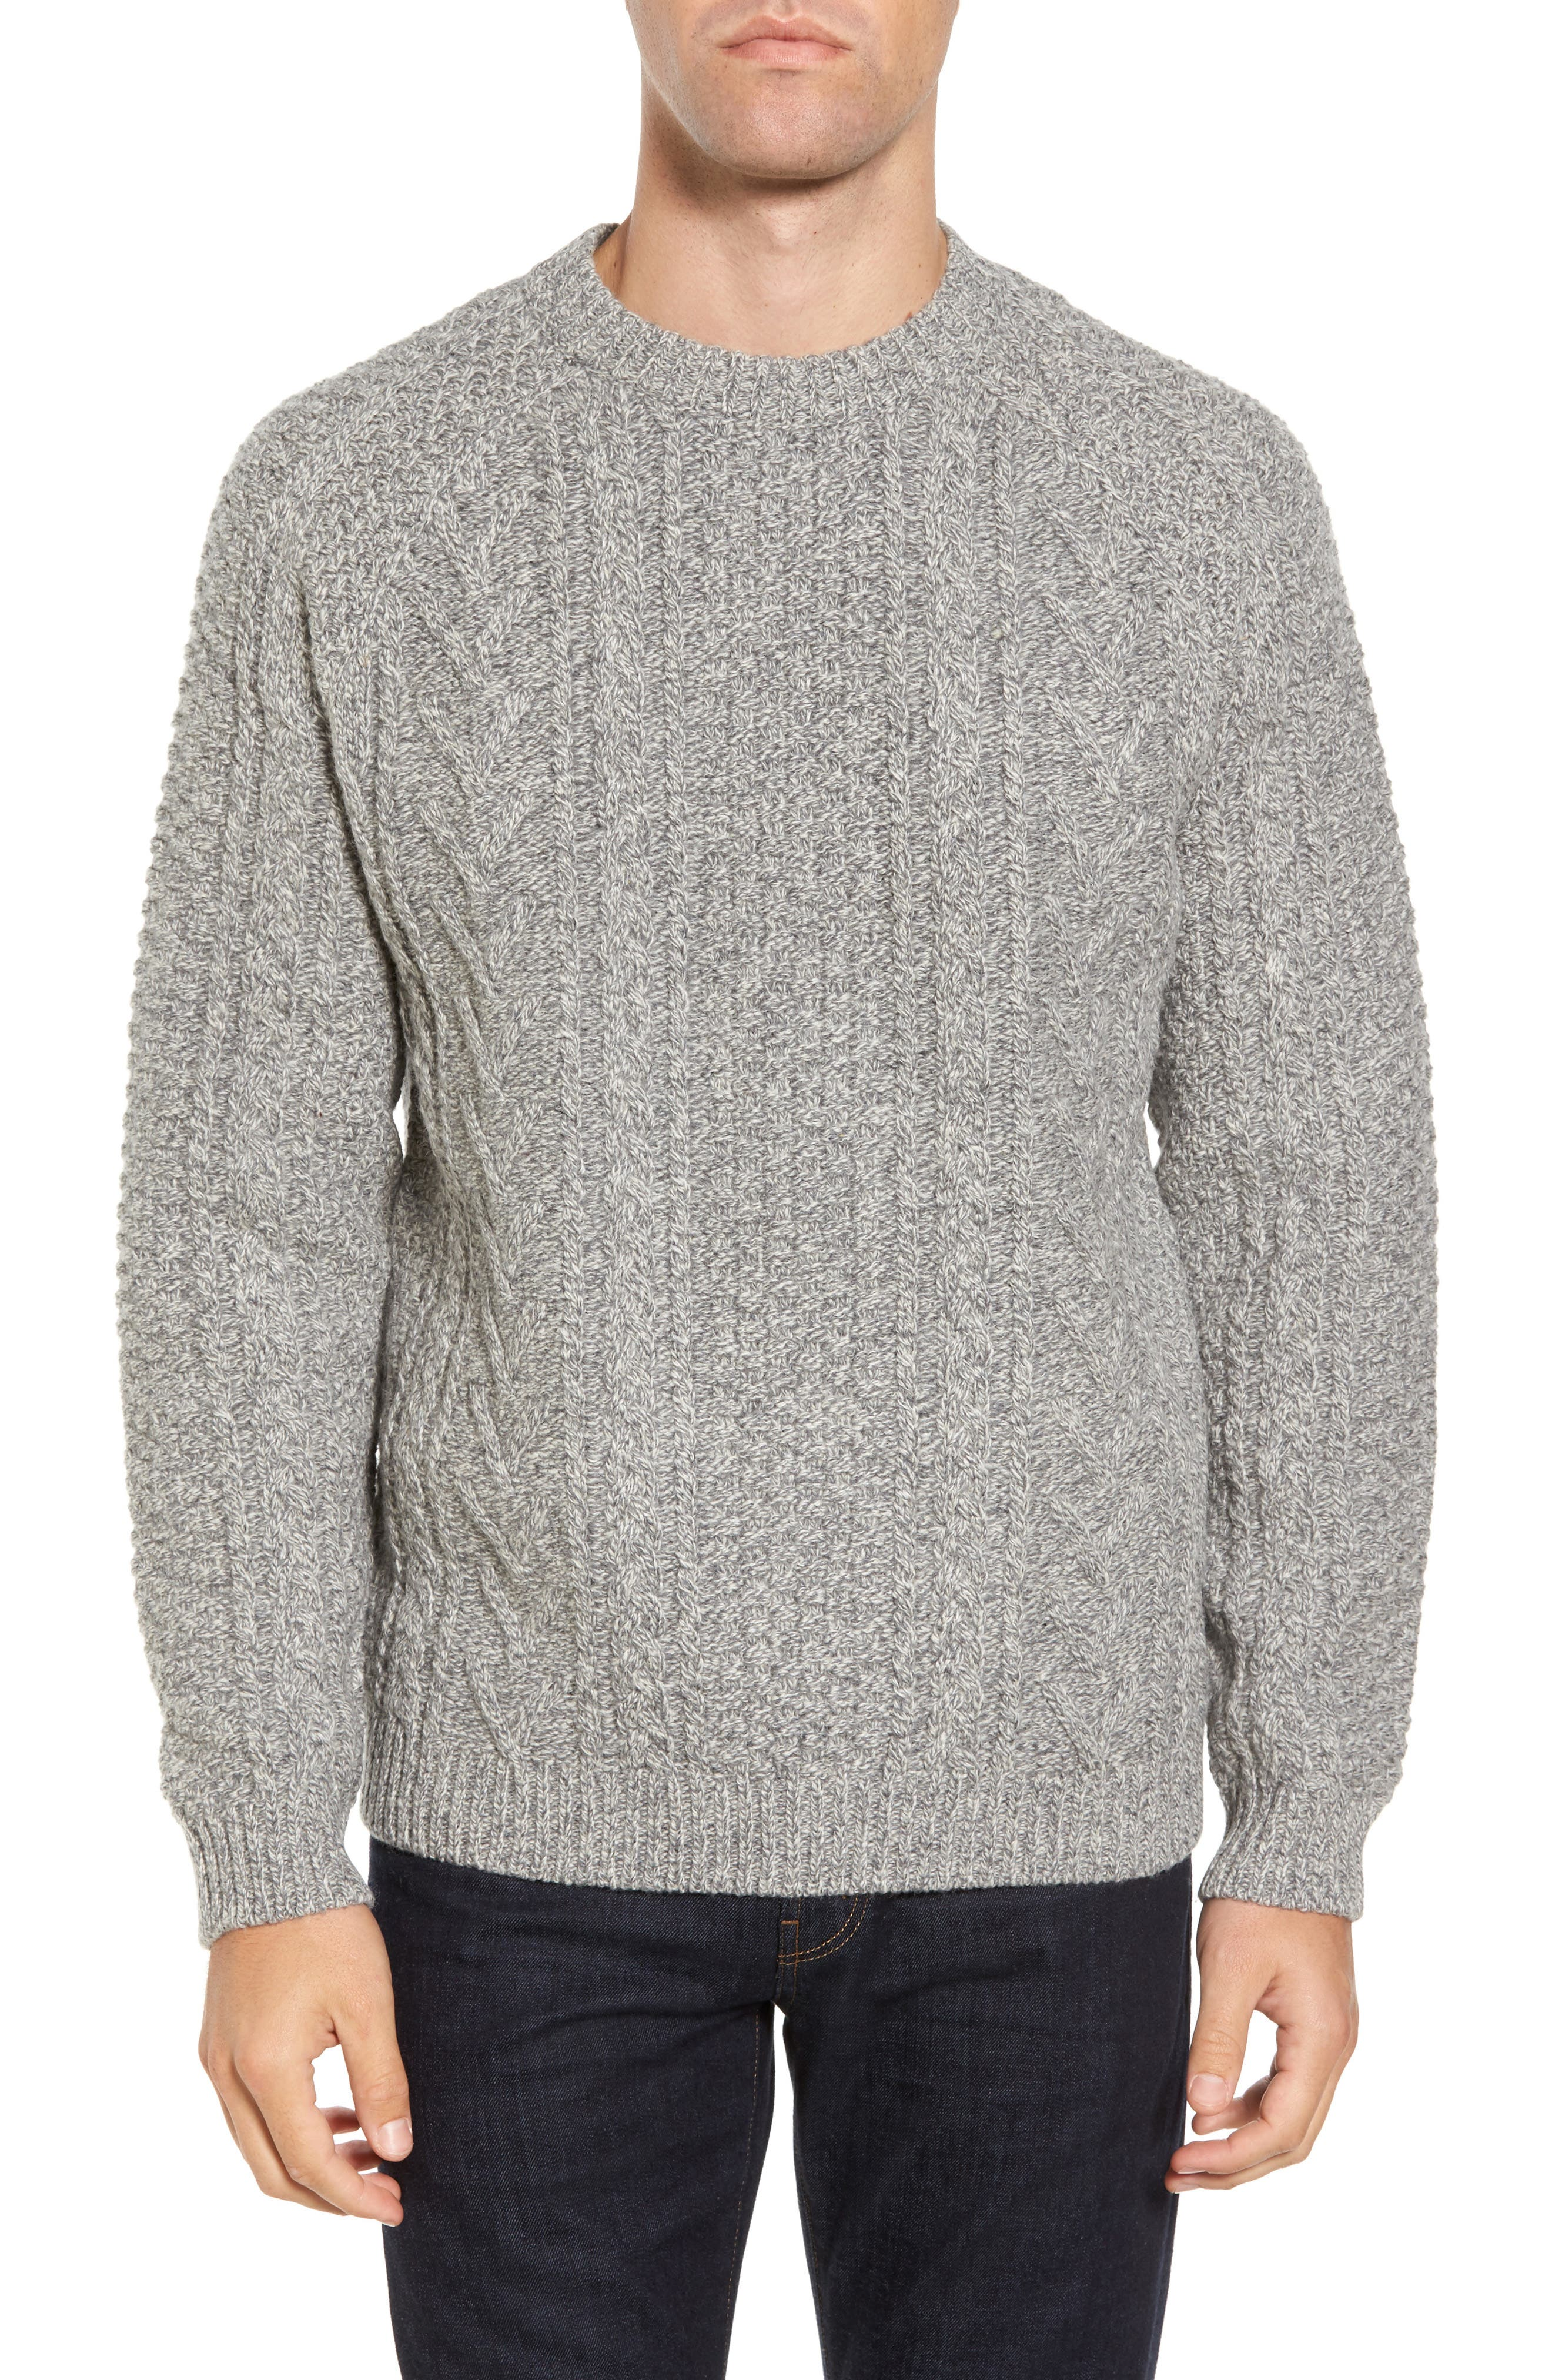 Fisherman Knit Wool Blend Sweater,                             Main thumbnail 1, color,